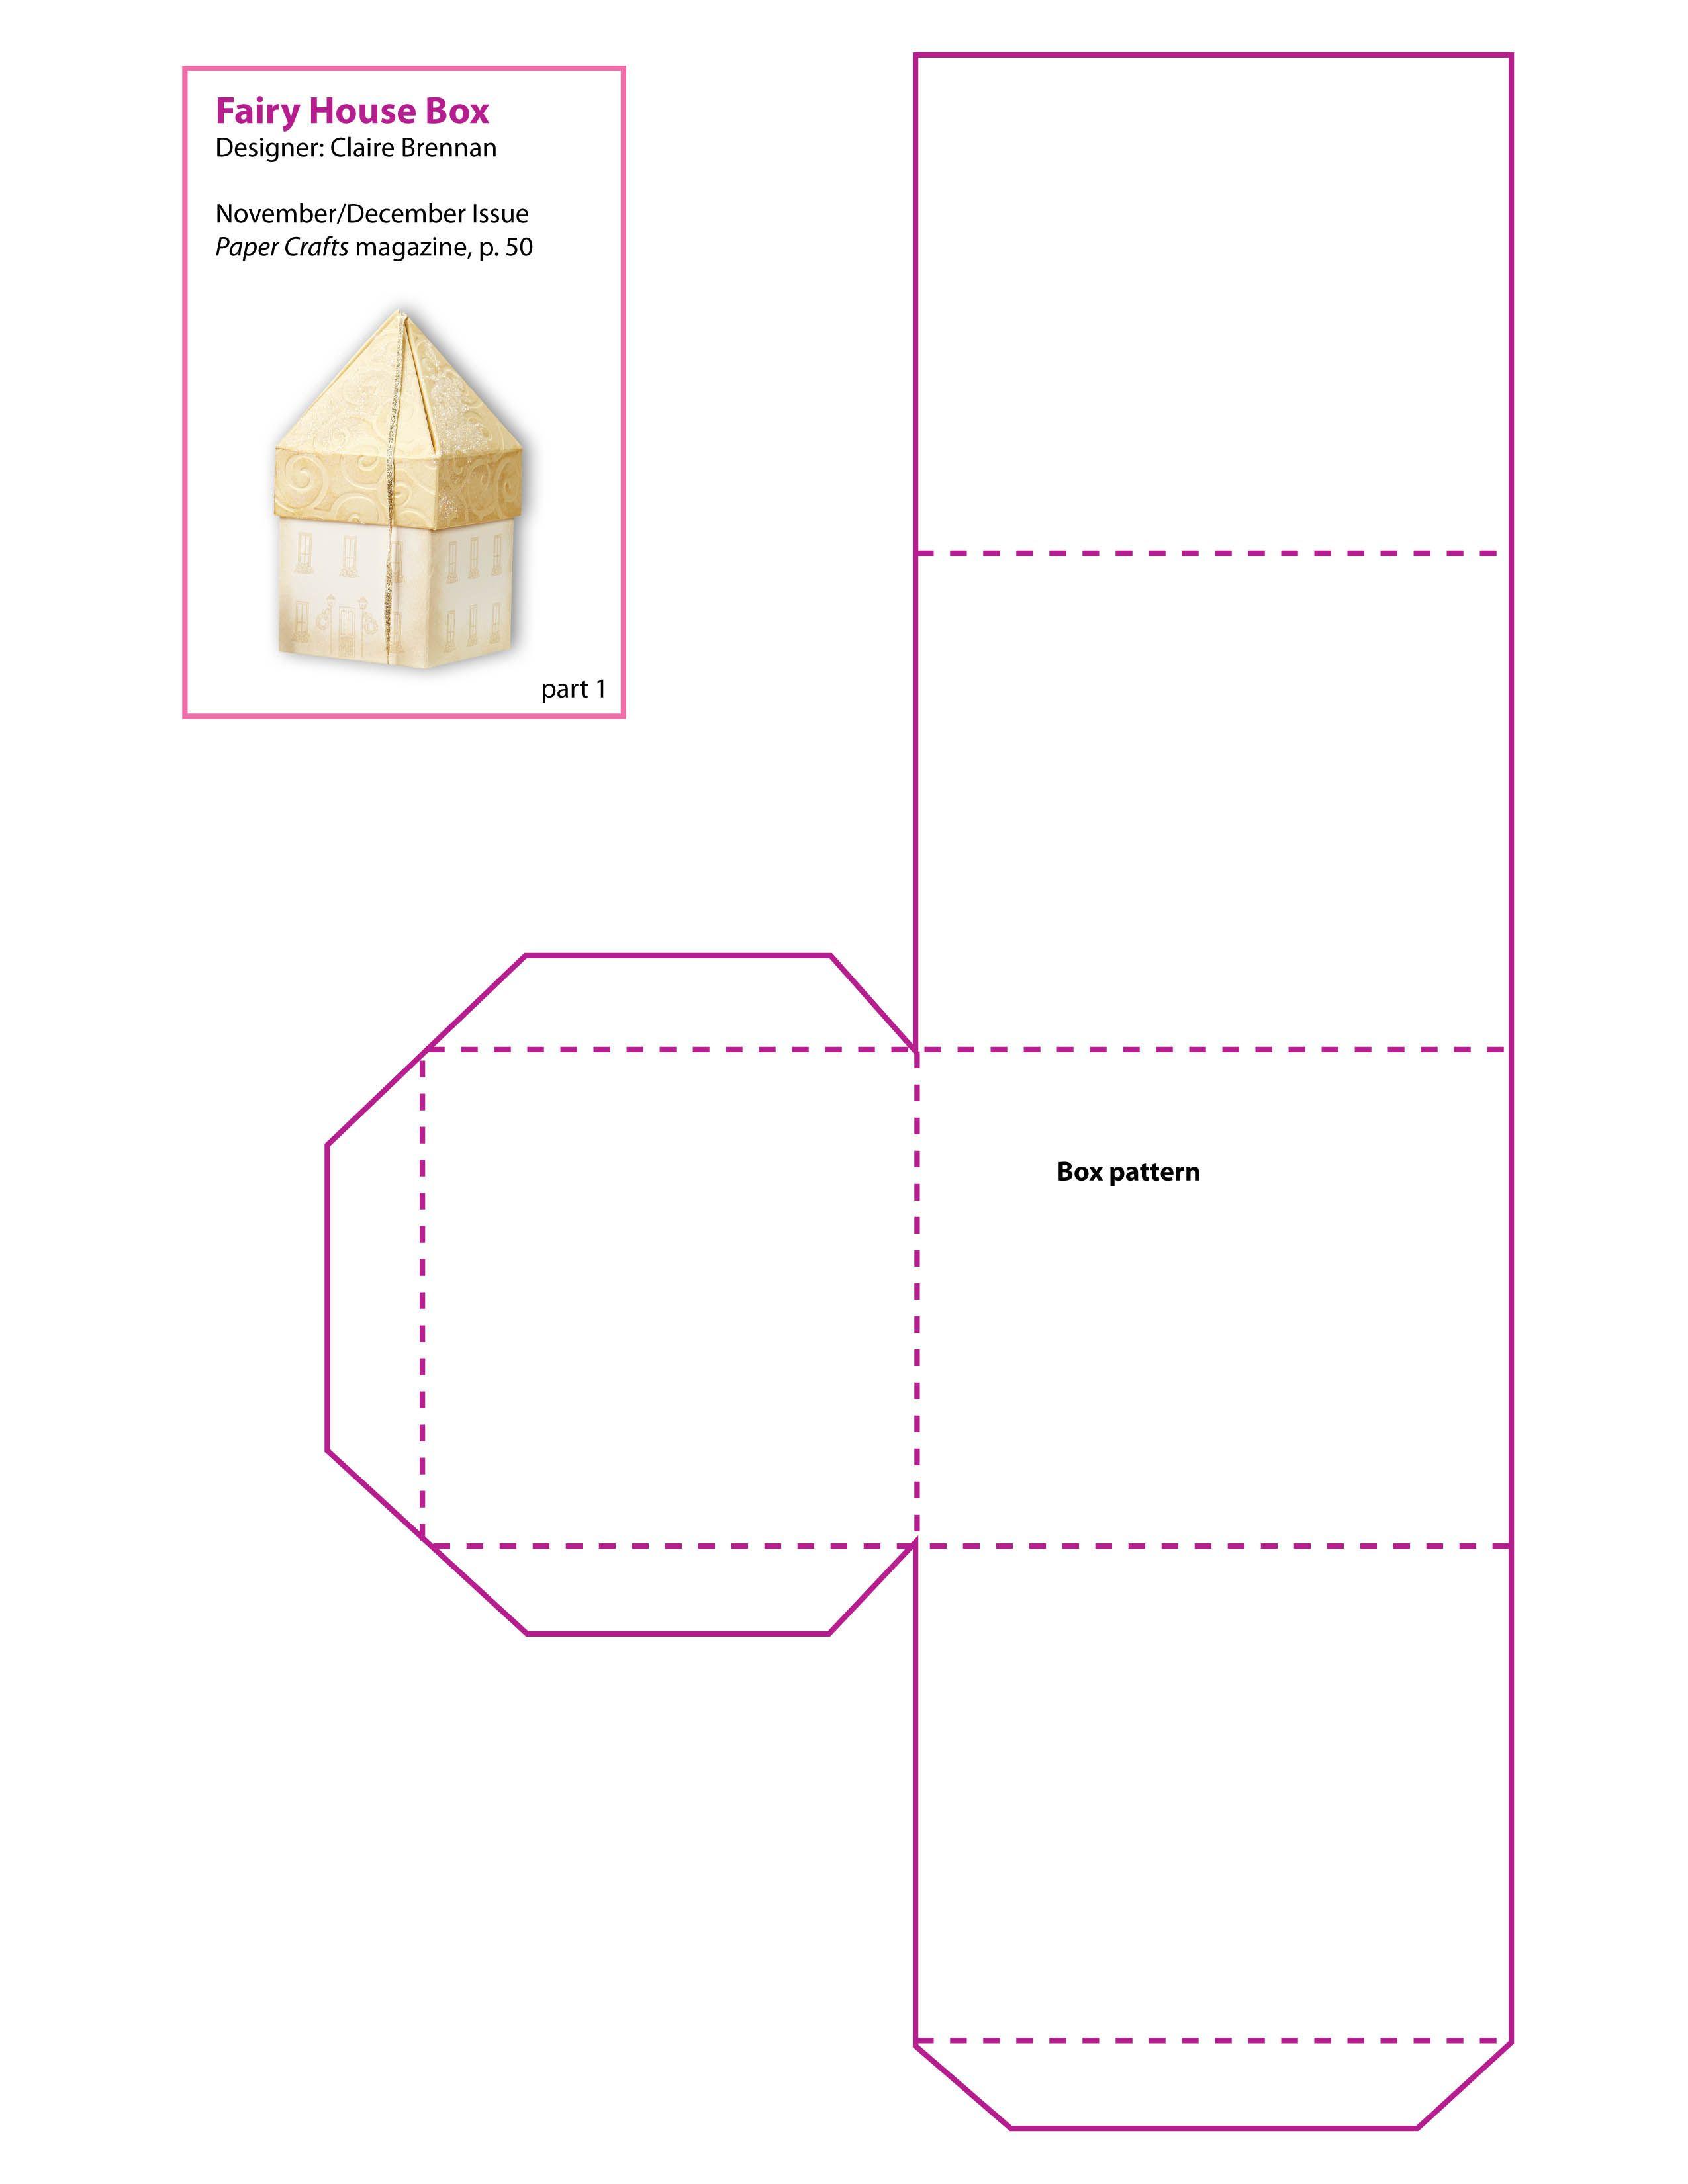 001 Box Templates Free Printable Template Ideas ~ Ulyssesroom - Printable Box Templates Free Download